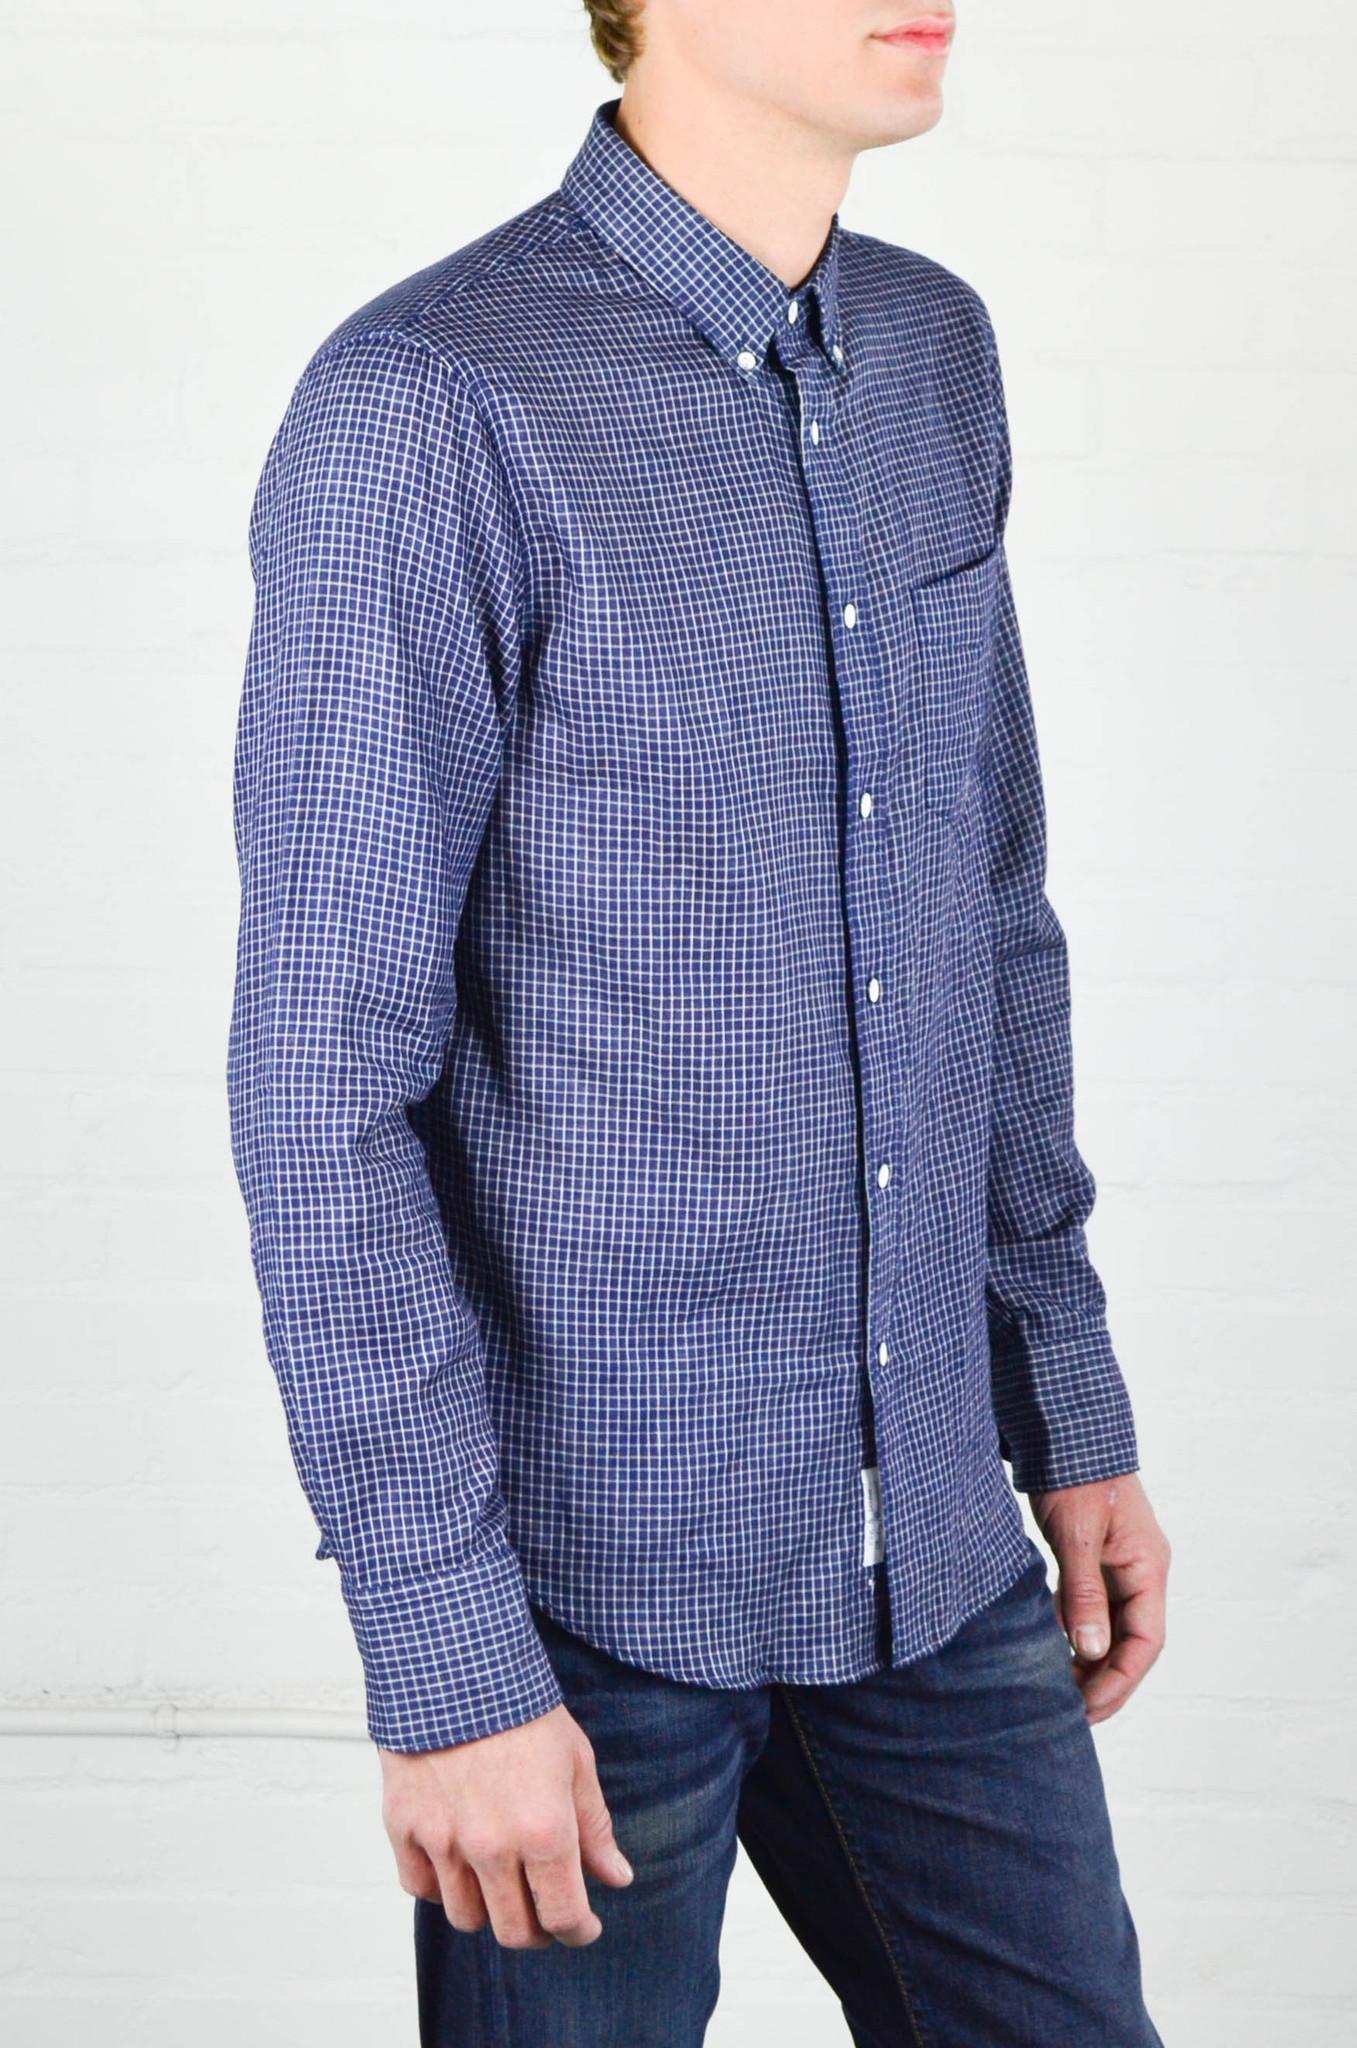 Men 39 s rag and bone indigo check yokohama shirt from hub for Rag and bone mens shirts sale